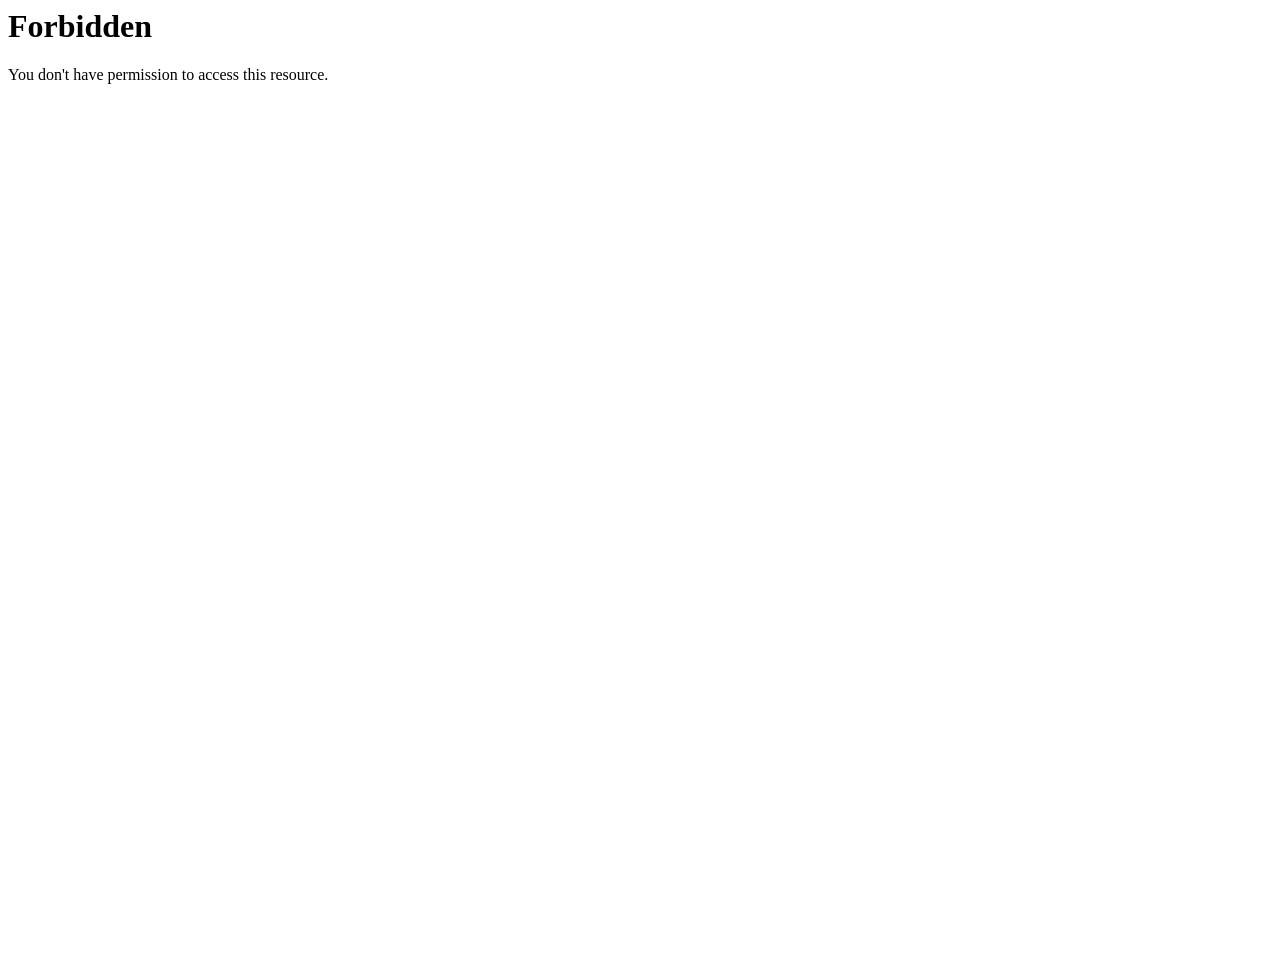 Voicemail FAQs - Verizon Wireless